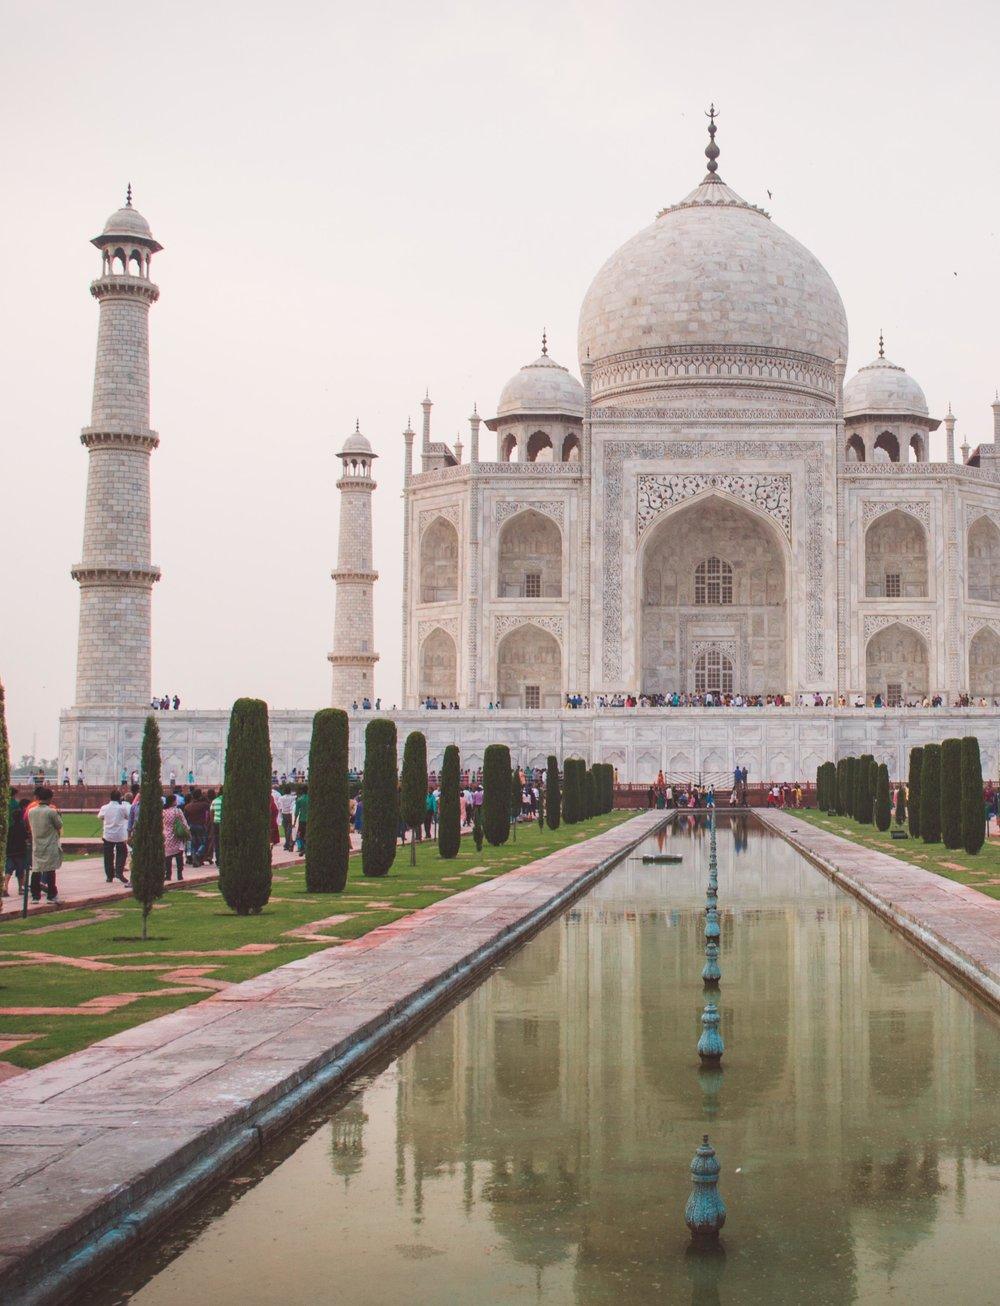 Taj Mahal 2 cropped pixabay CC0 license